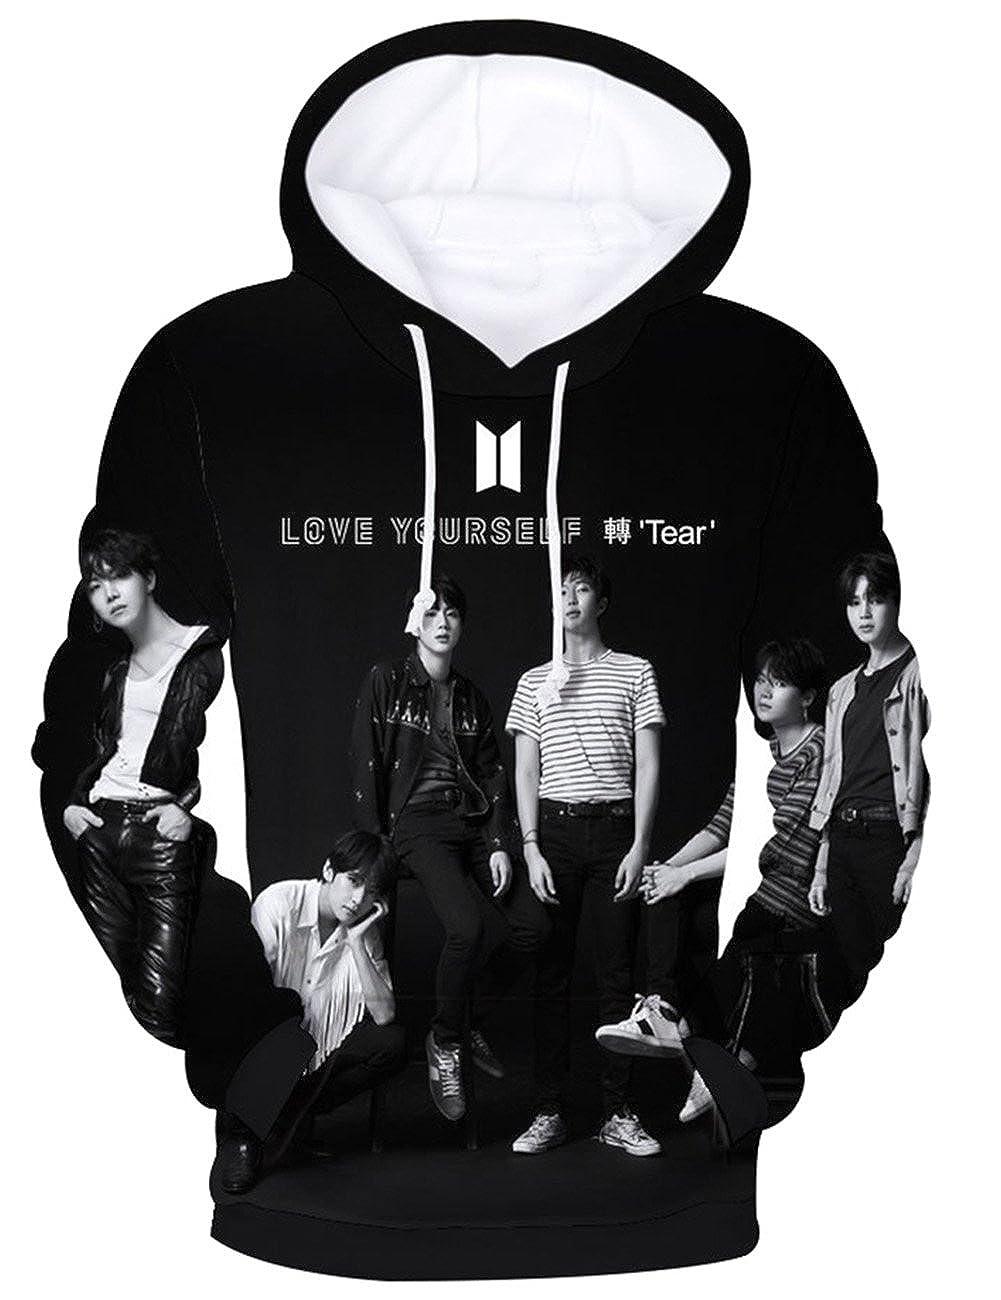 d34cb6d0cc029 Fancyku Kpop BTS Unisex 3D Printed Hoodie Sweatshirt Bangtan Boys Printed Pullover  Sweater V Rap-Monster Suga Jin Jimin J-Hope Jung Kook Jacket Pullover